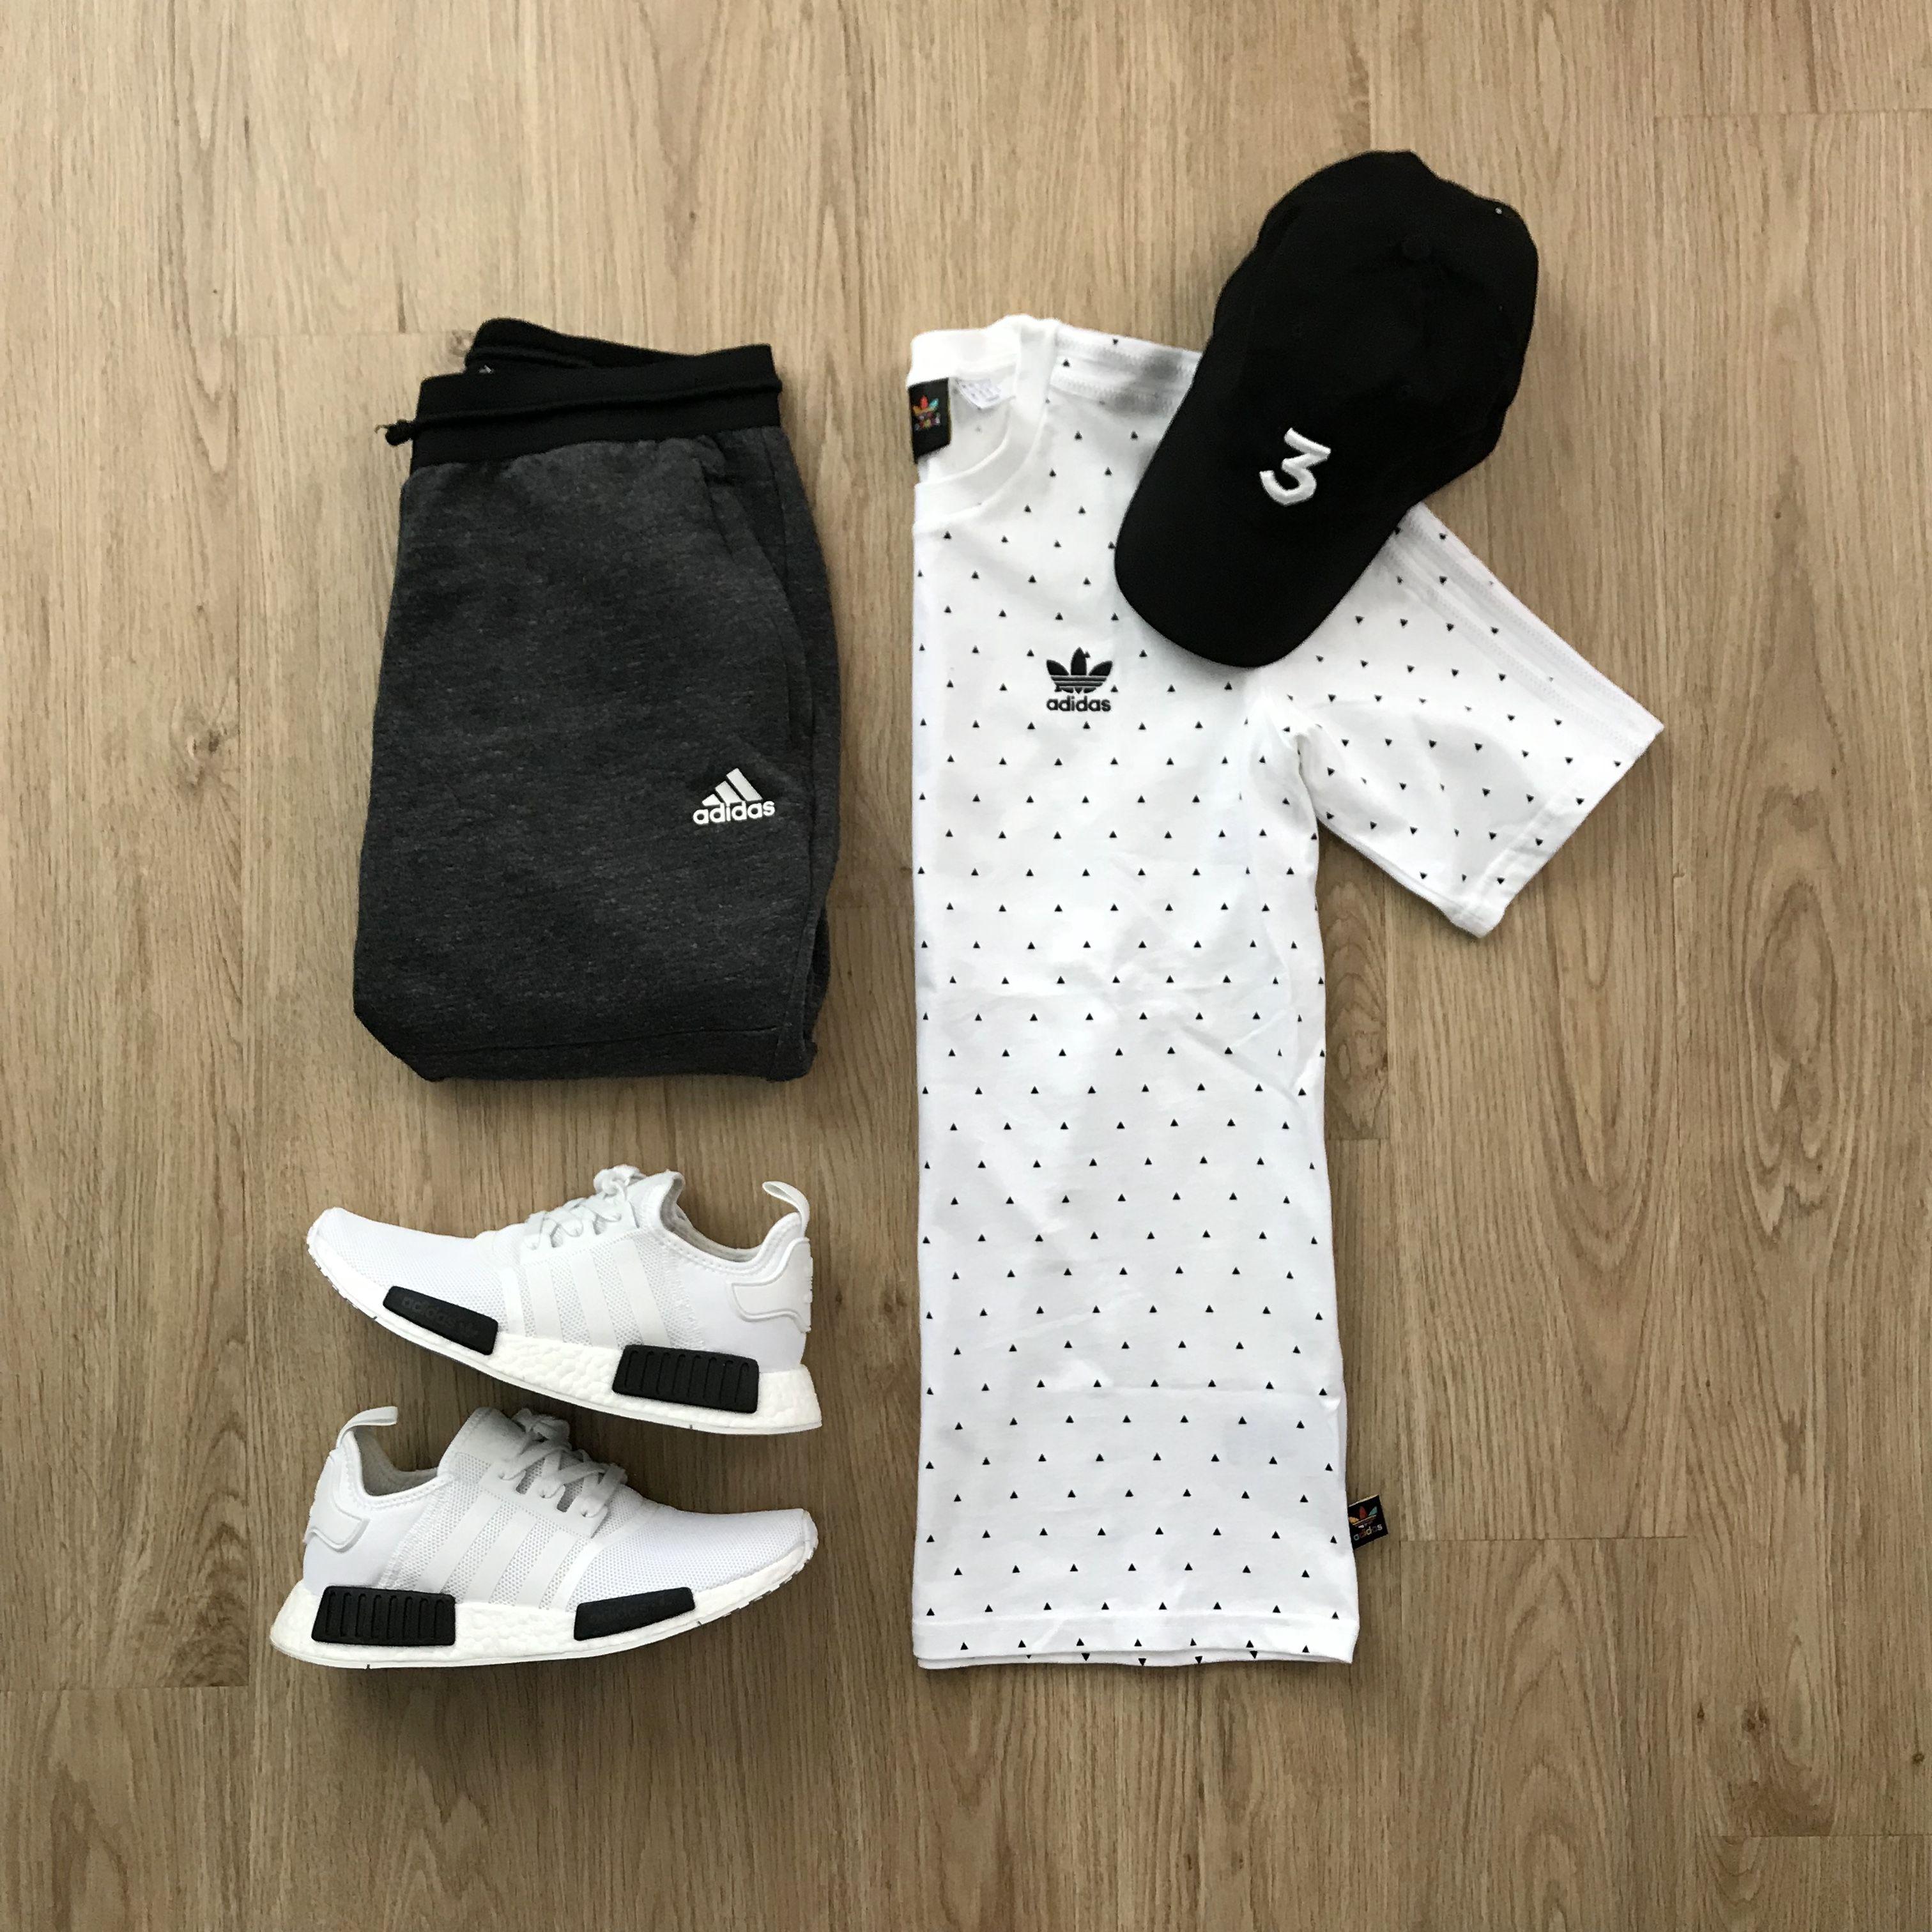 Nacarado Visible mosaico  Compras > ropa adidas china